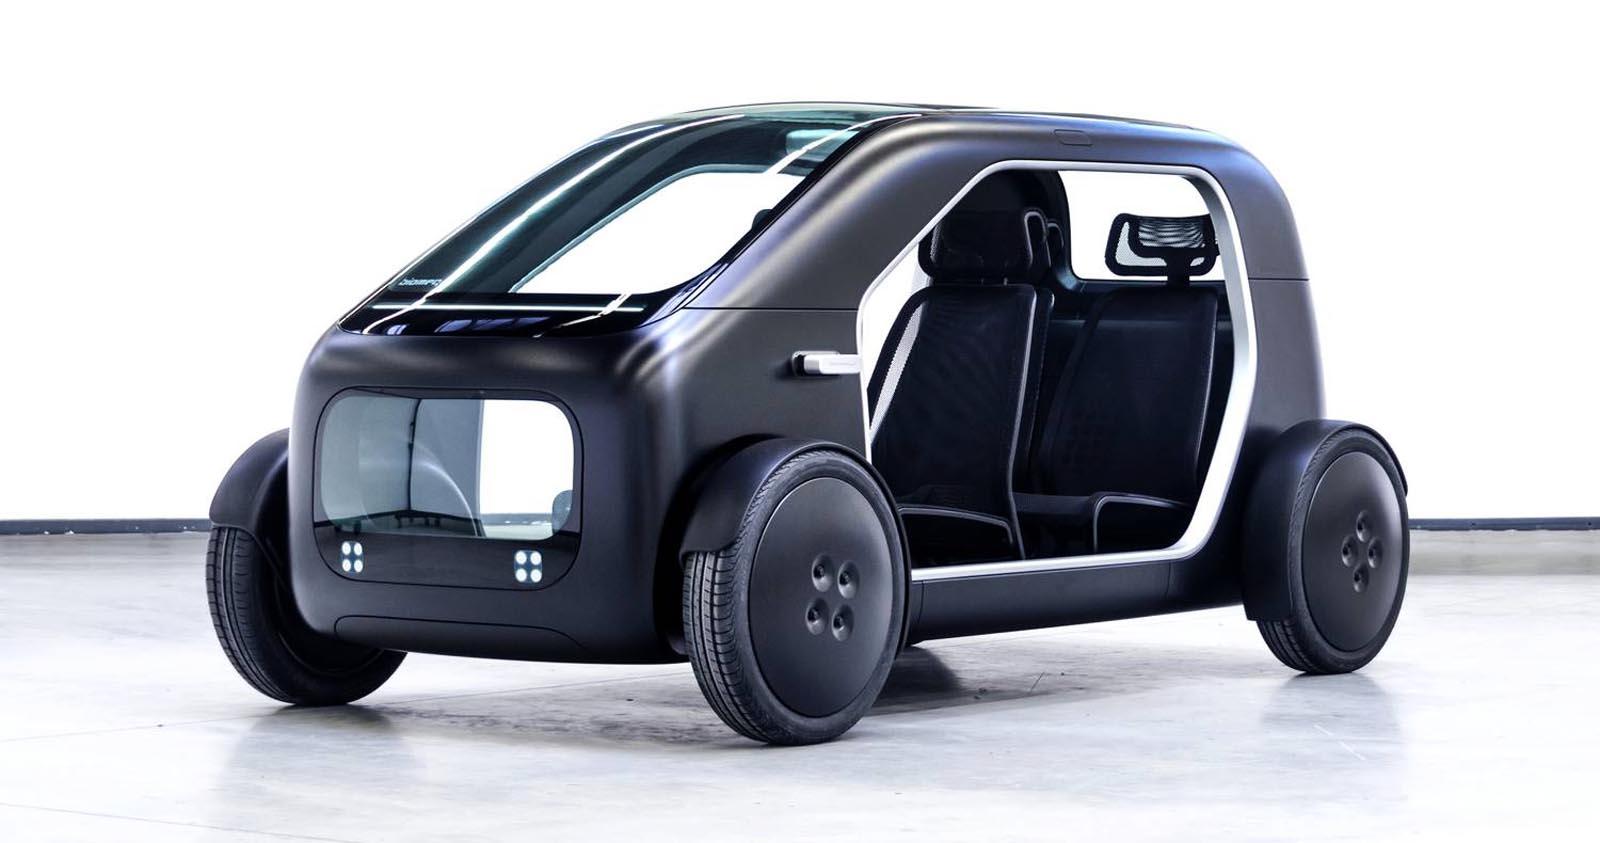 Photo of Το Biomega SIN Concept είναι ένα πολύ ενδιαφέρον ηλεκτρικό αυτοκίνητο [blog]